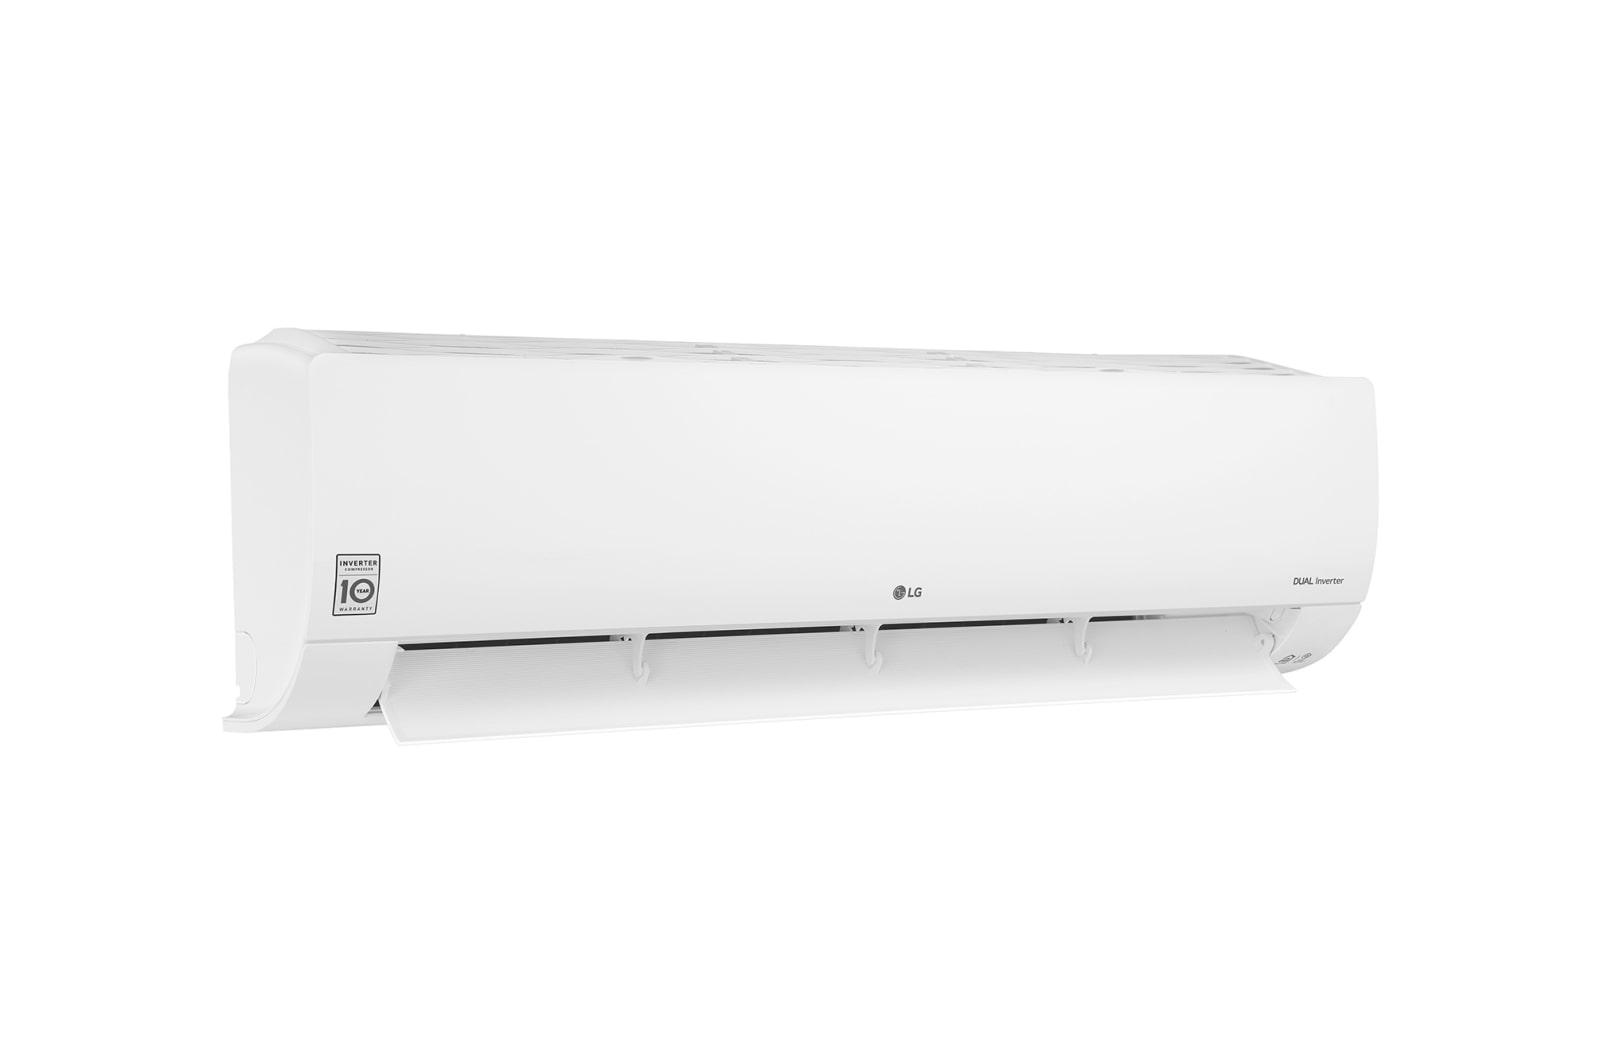 reputable site 83418 cf4c2 Dual Inverter - Titan, 38,000 BTU(Max 38,000 BTU) Cool Only, Split Air  Conditioner with Wi-Fi control and Ionizer, 50 60Hz